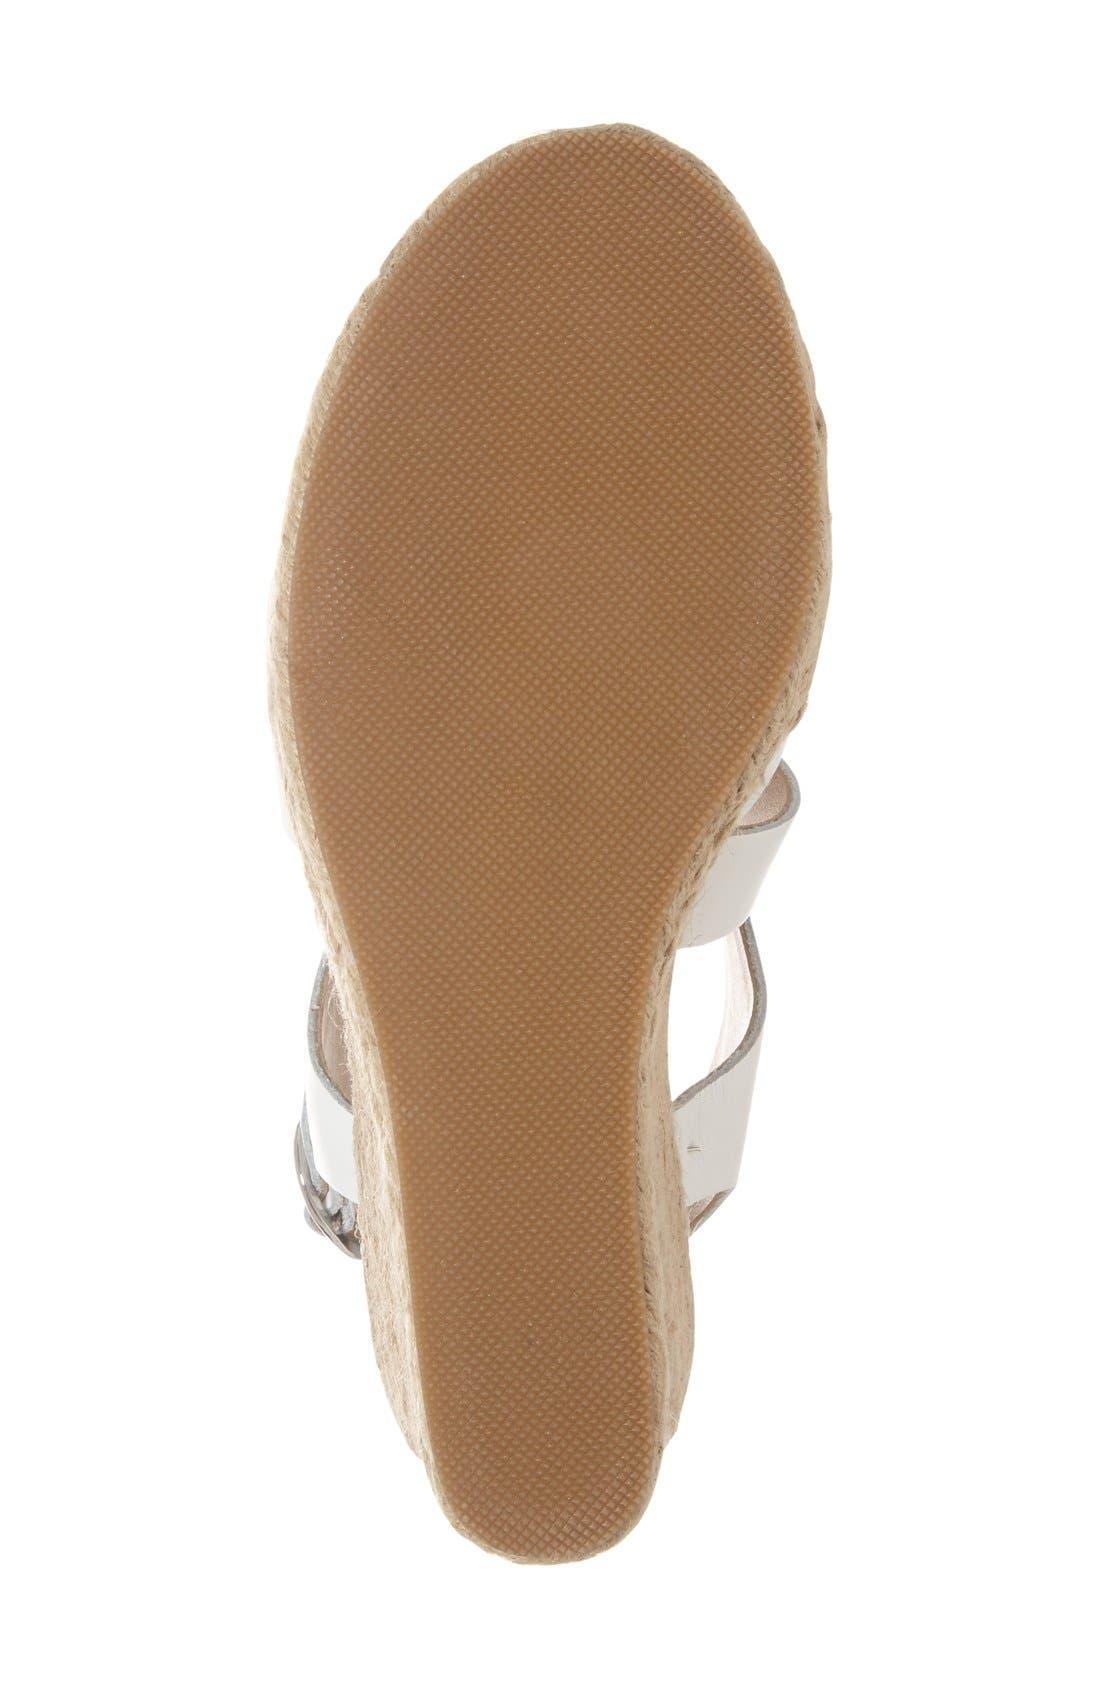 'Wavi' Espadrille Wedge Sandal,                             Alternate thumbnail 4, color,                             White Leather